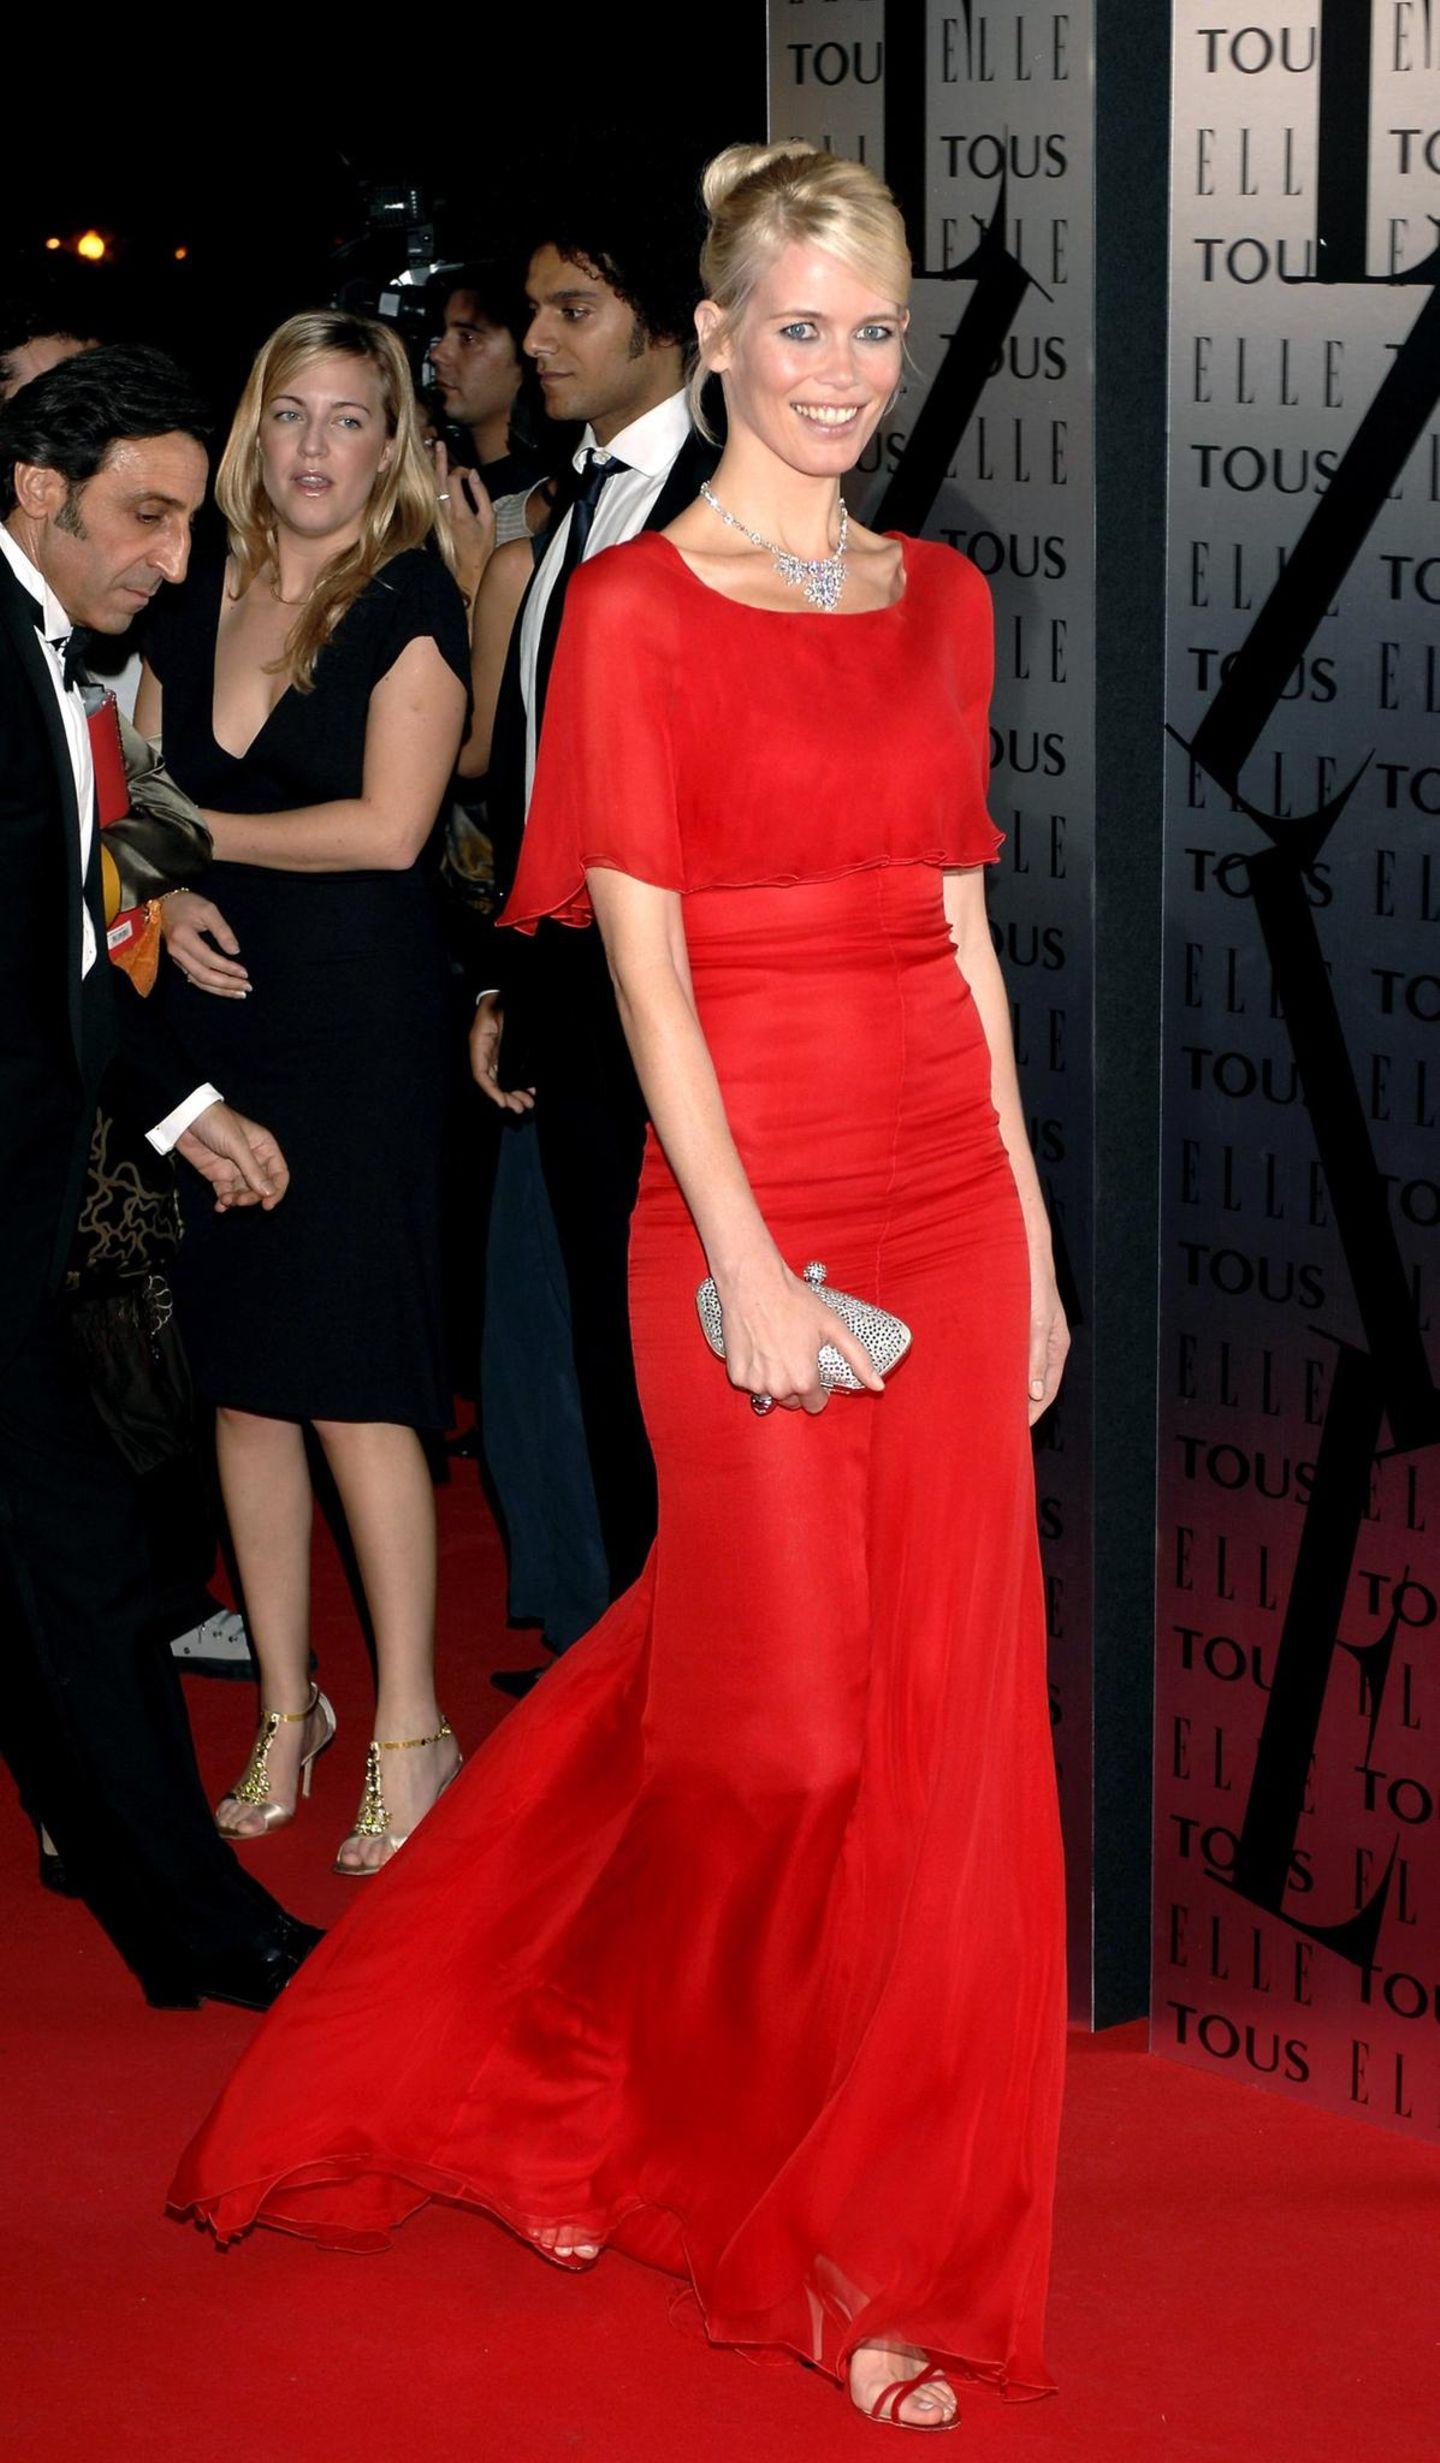 Claudia Schiffer: im roten Kleid